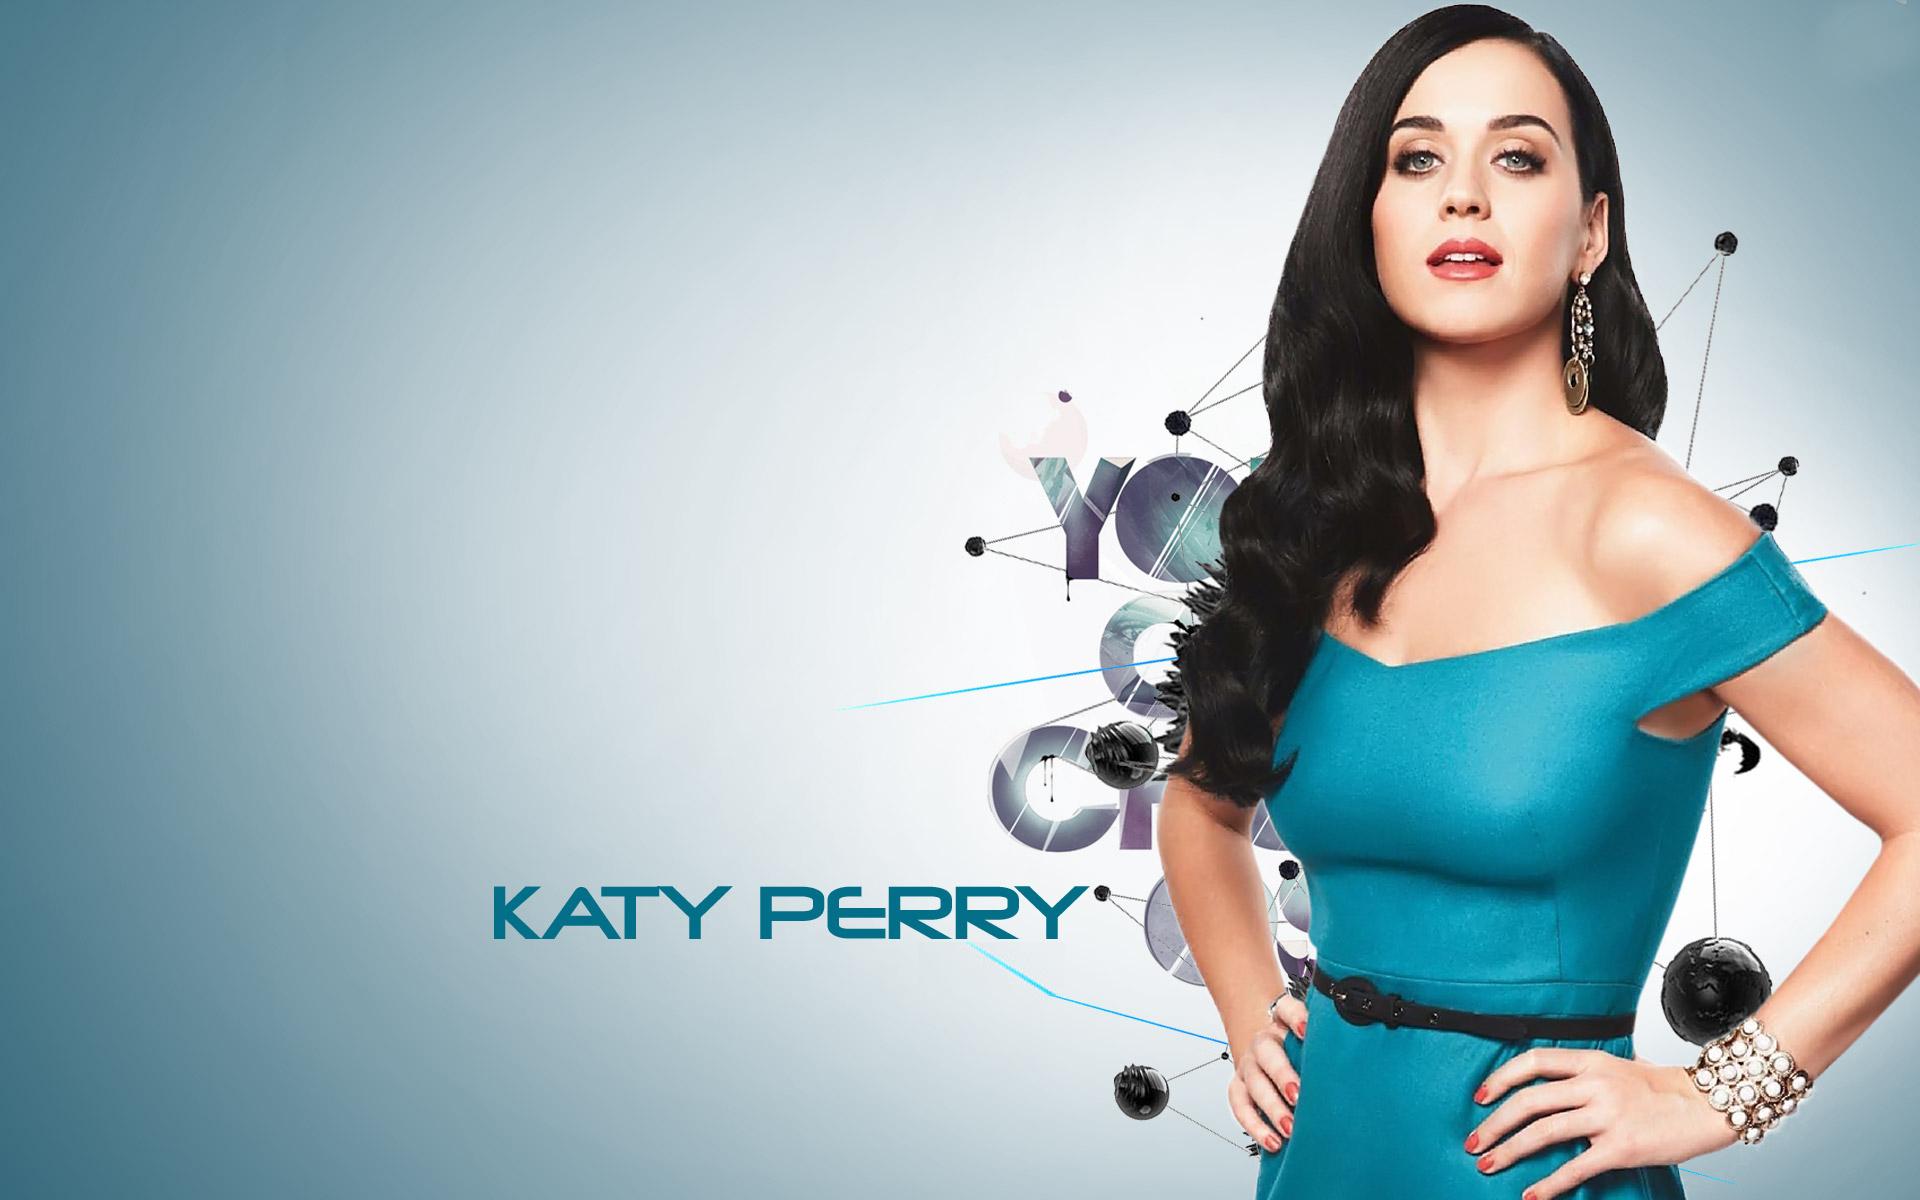 Fall Out Boy Christmas Wallpaper Desktop Katy Perry Hd Wallpapers Pixelstalk Net